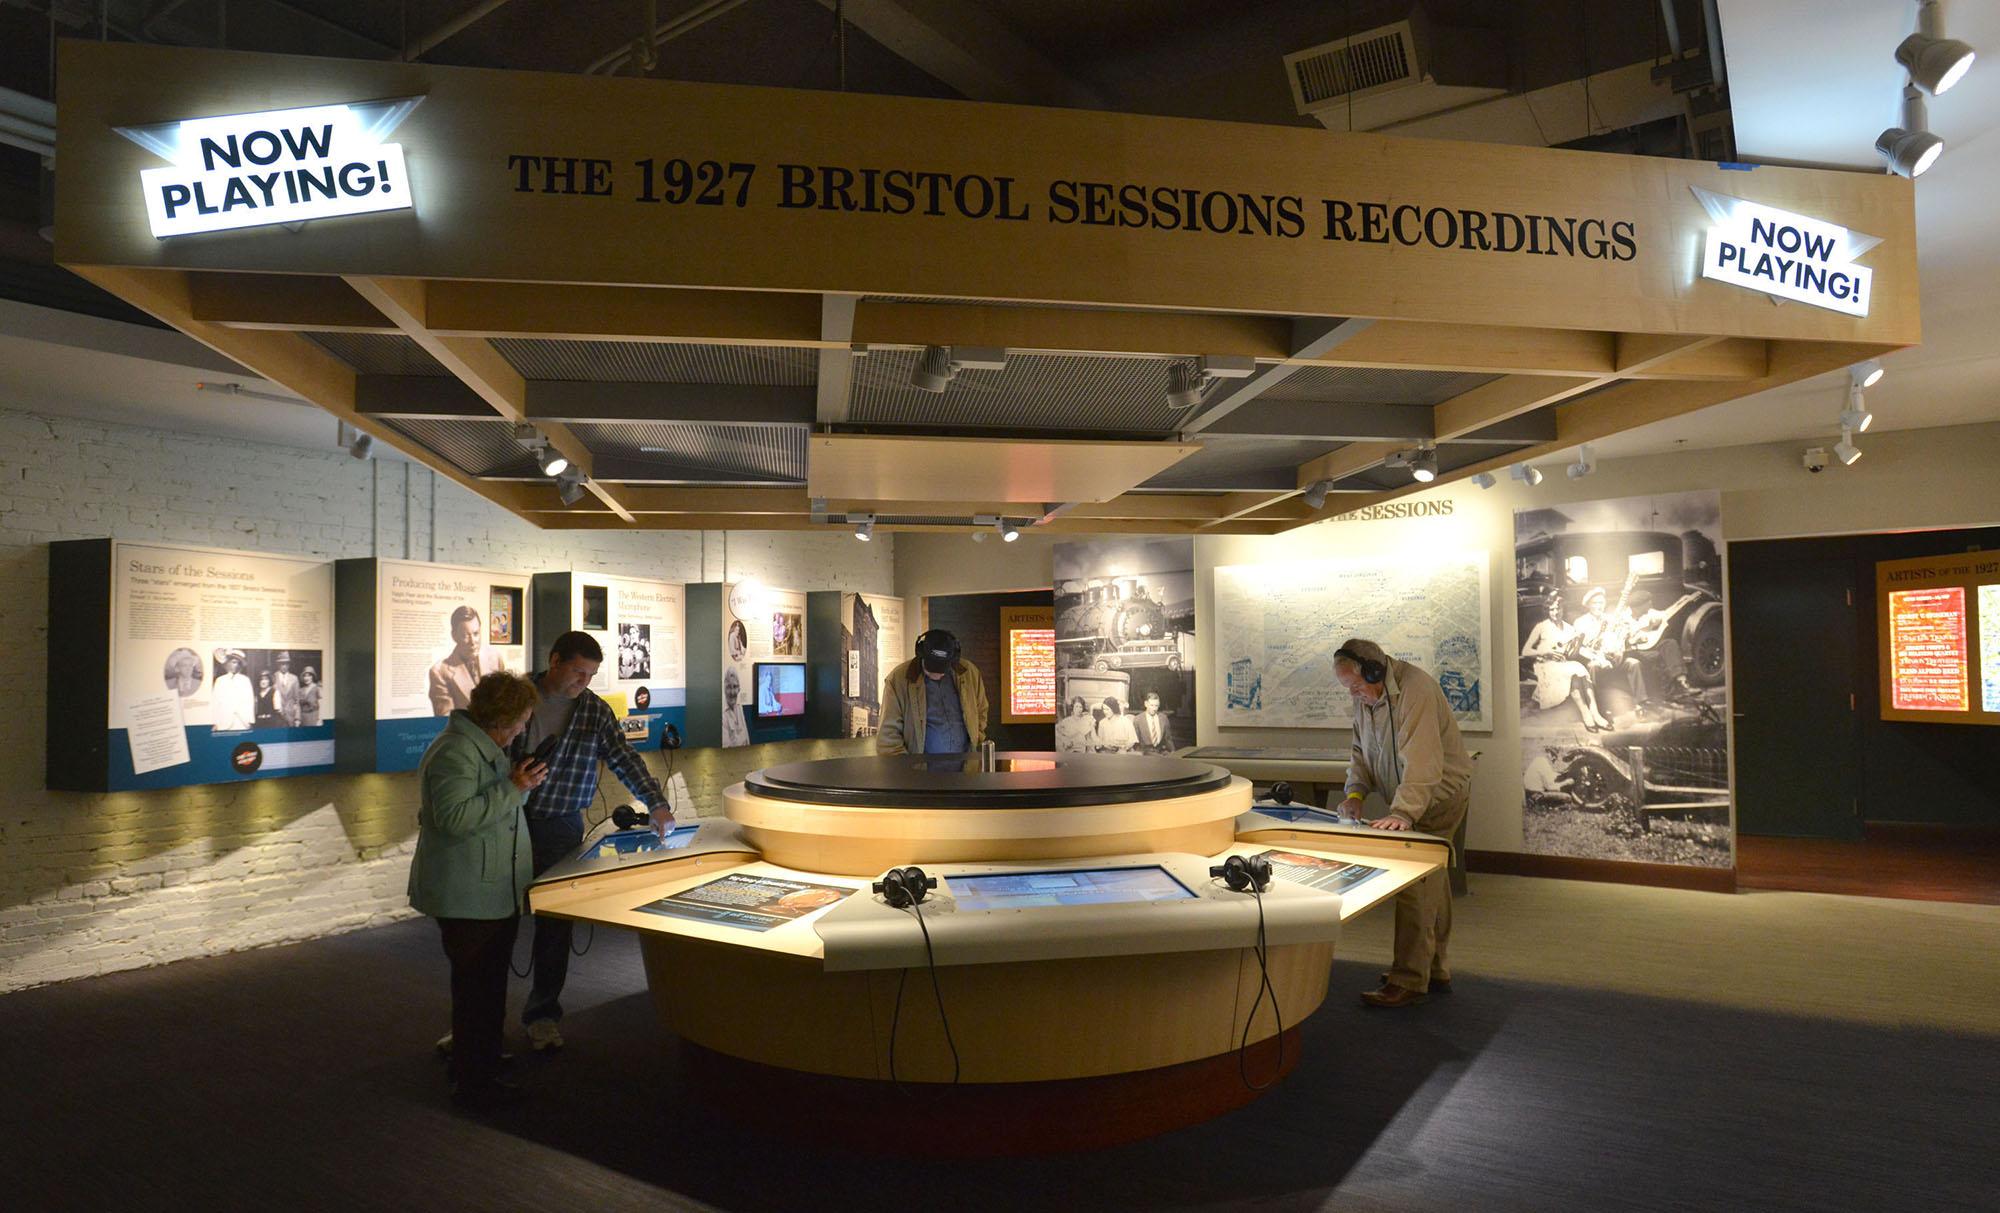 MUSIC LISTENING STATION ( Earl Neikirk, Bristol Herald Courier/Tricities.com )